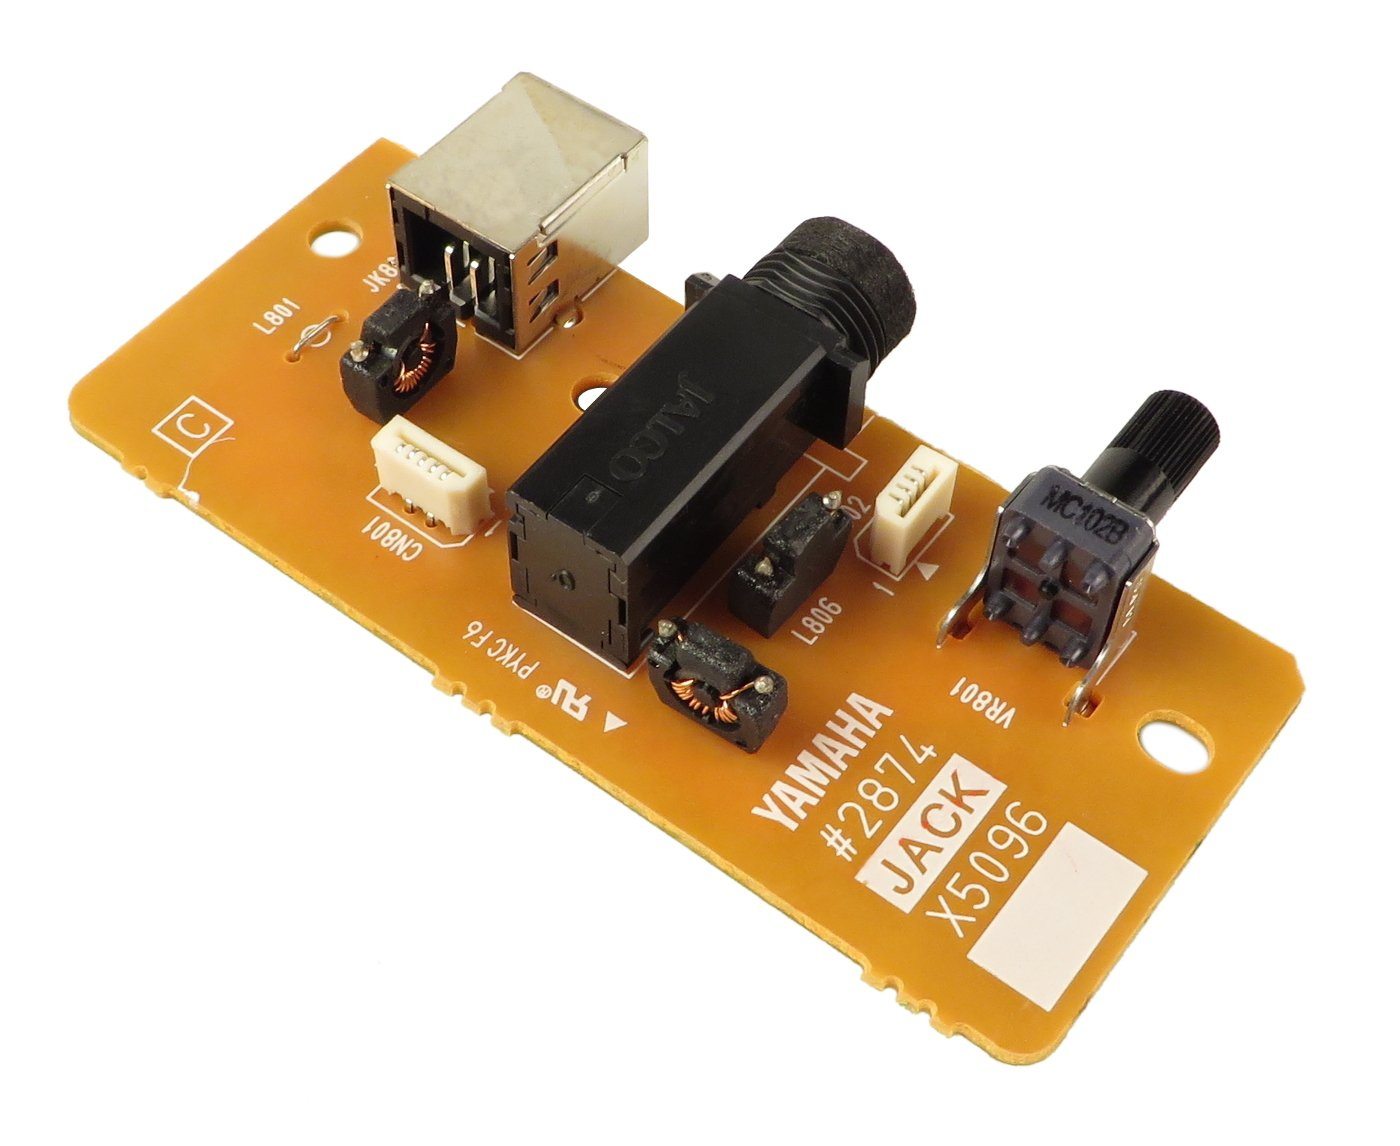 Jack PCB for DGX-505